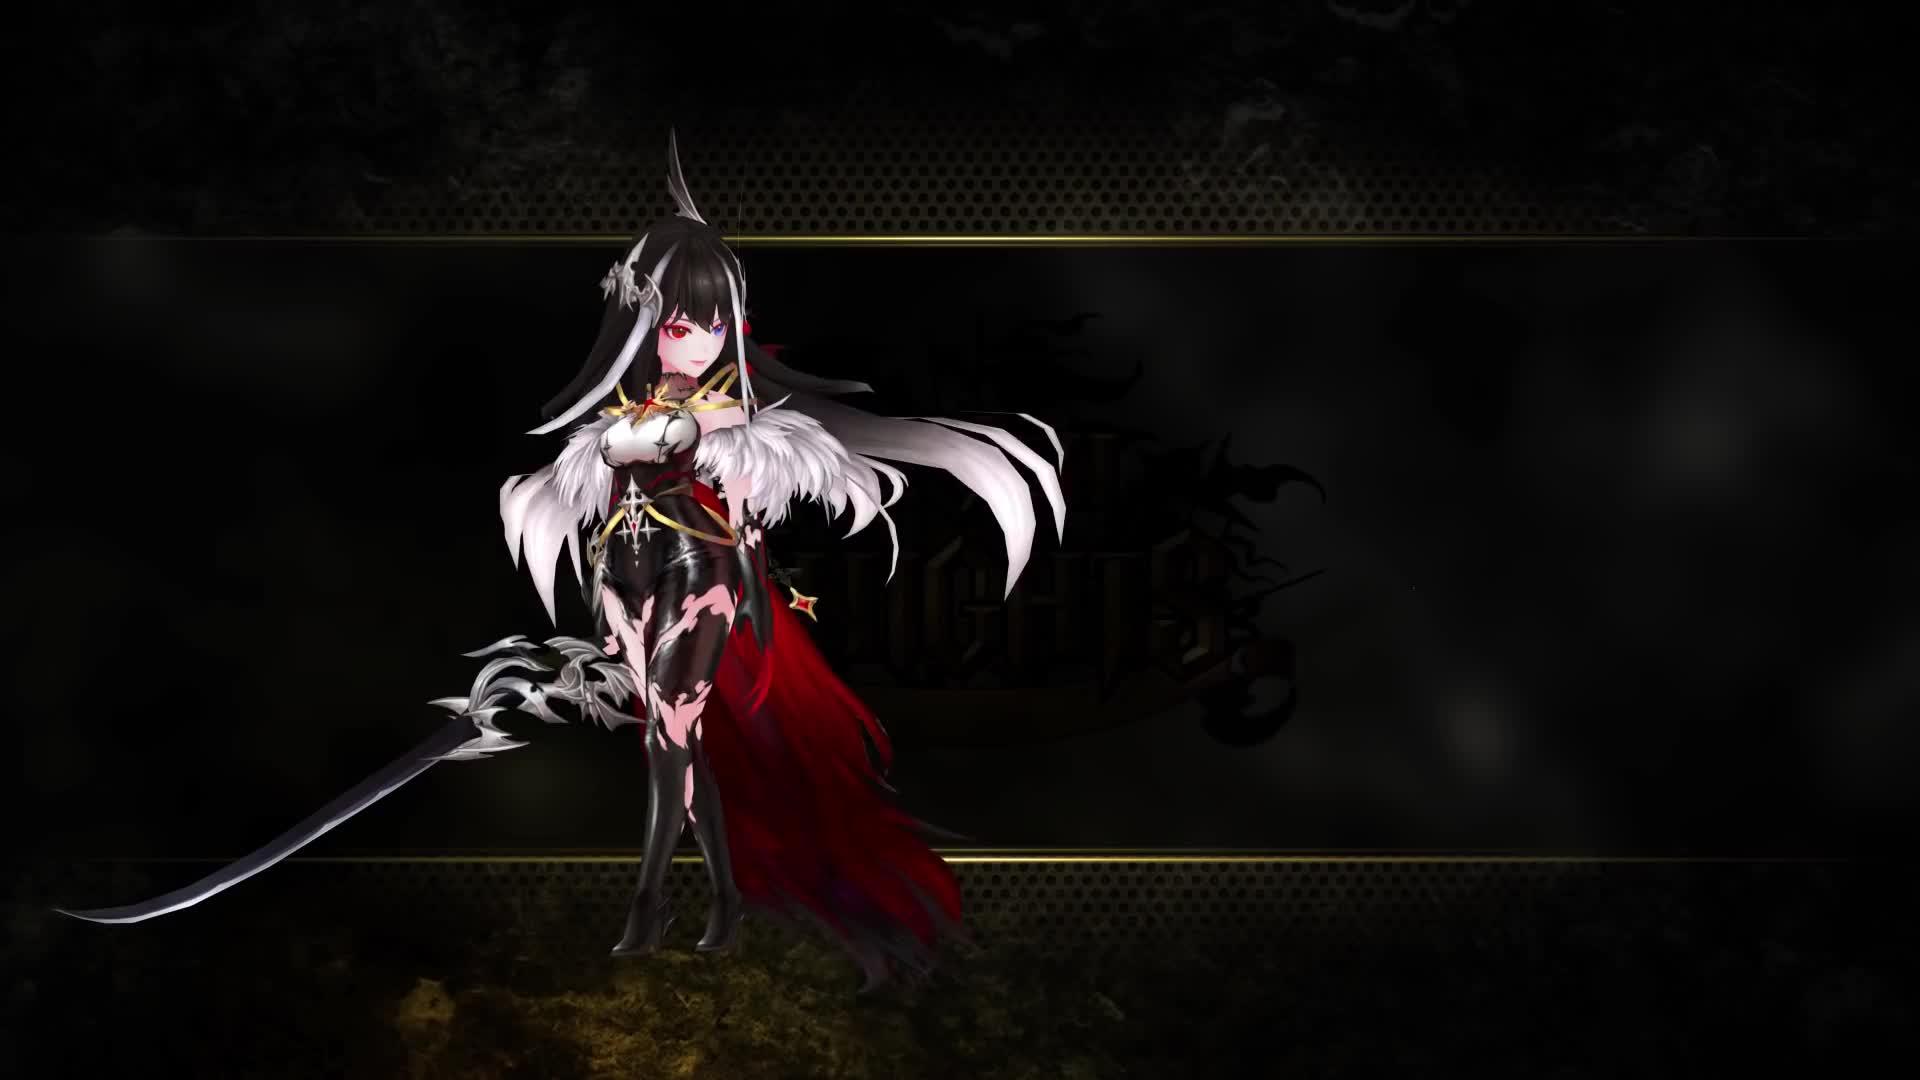 【a】seven knights - 韩服 赛因 神话觉醒